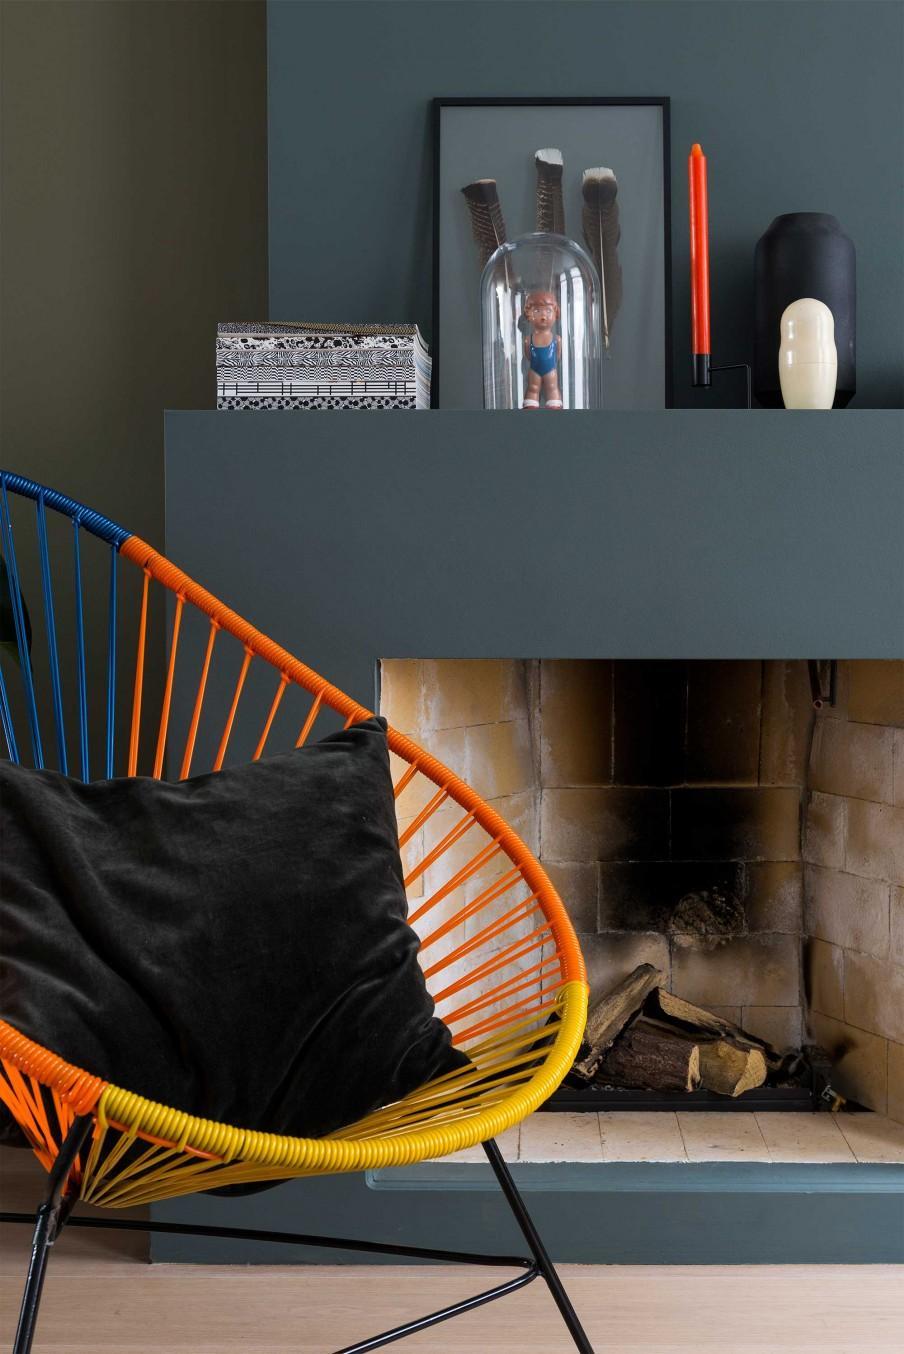 chaise lounge multicolore cheminée